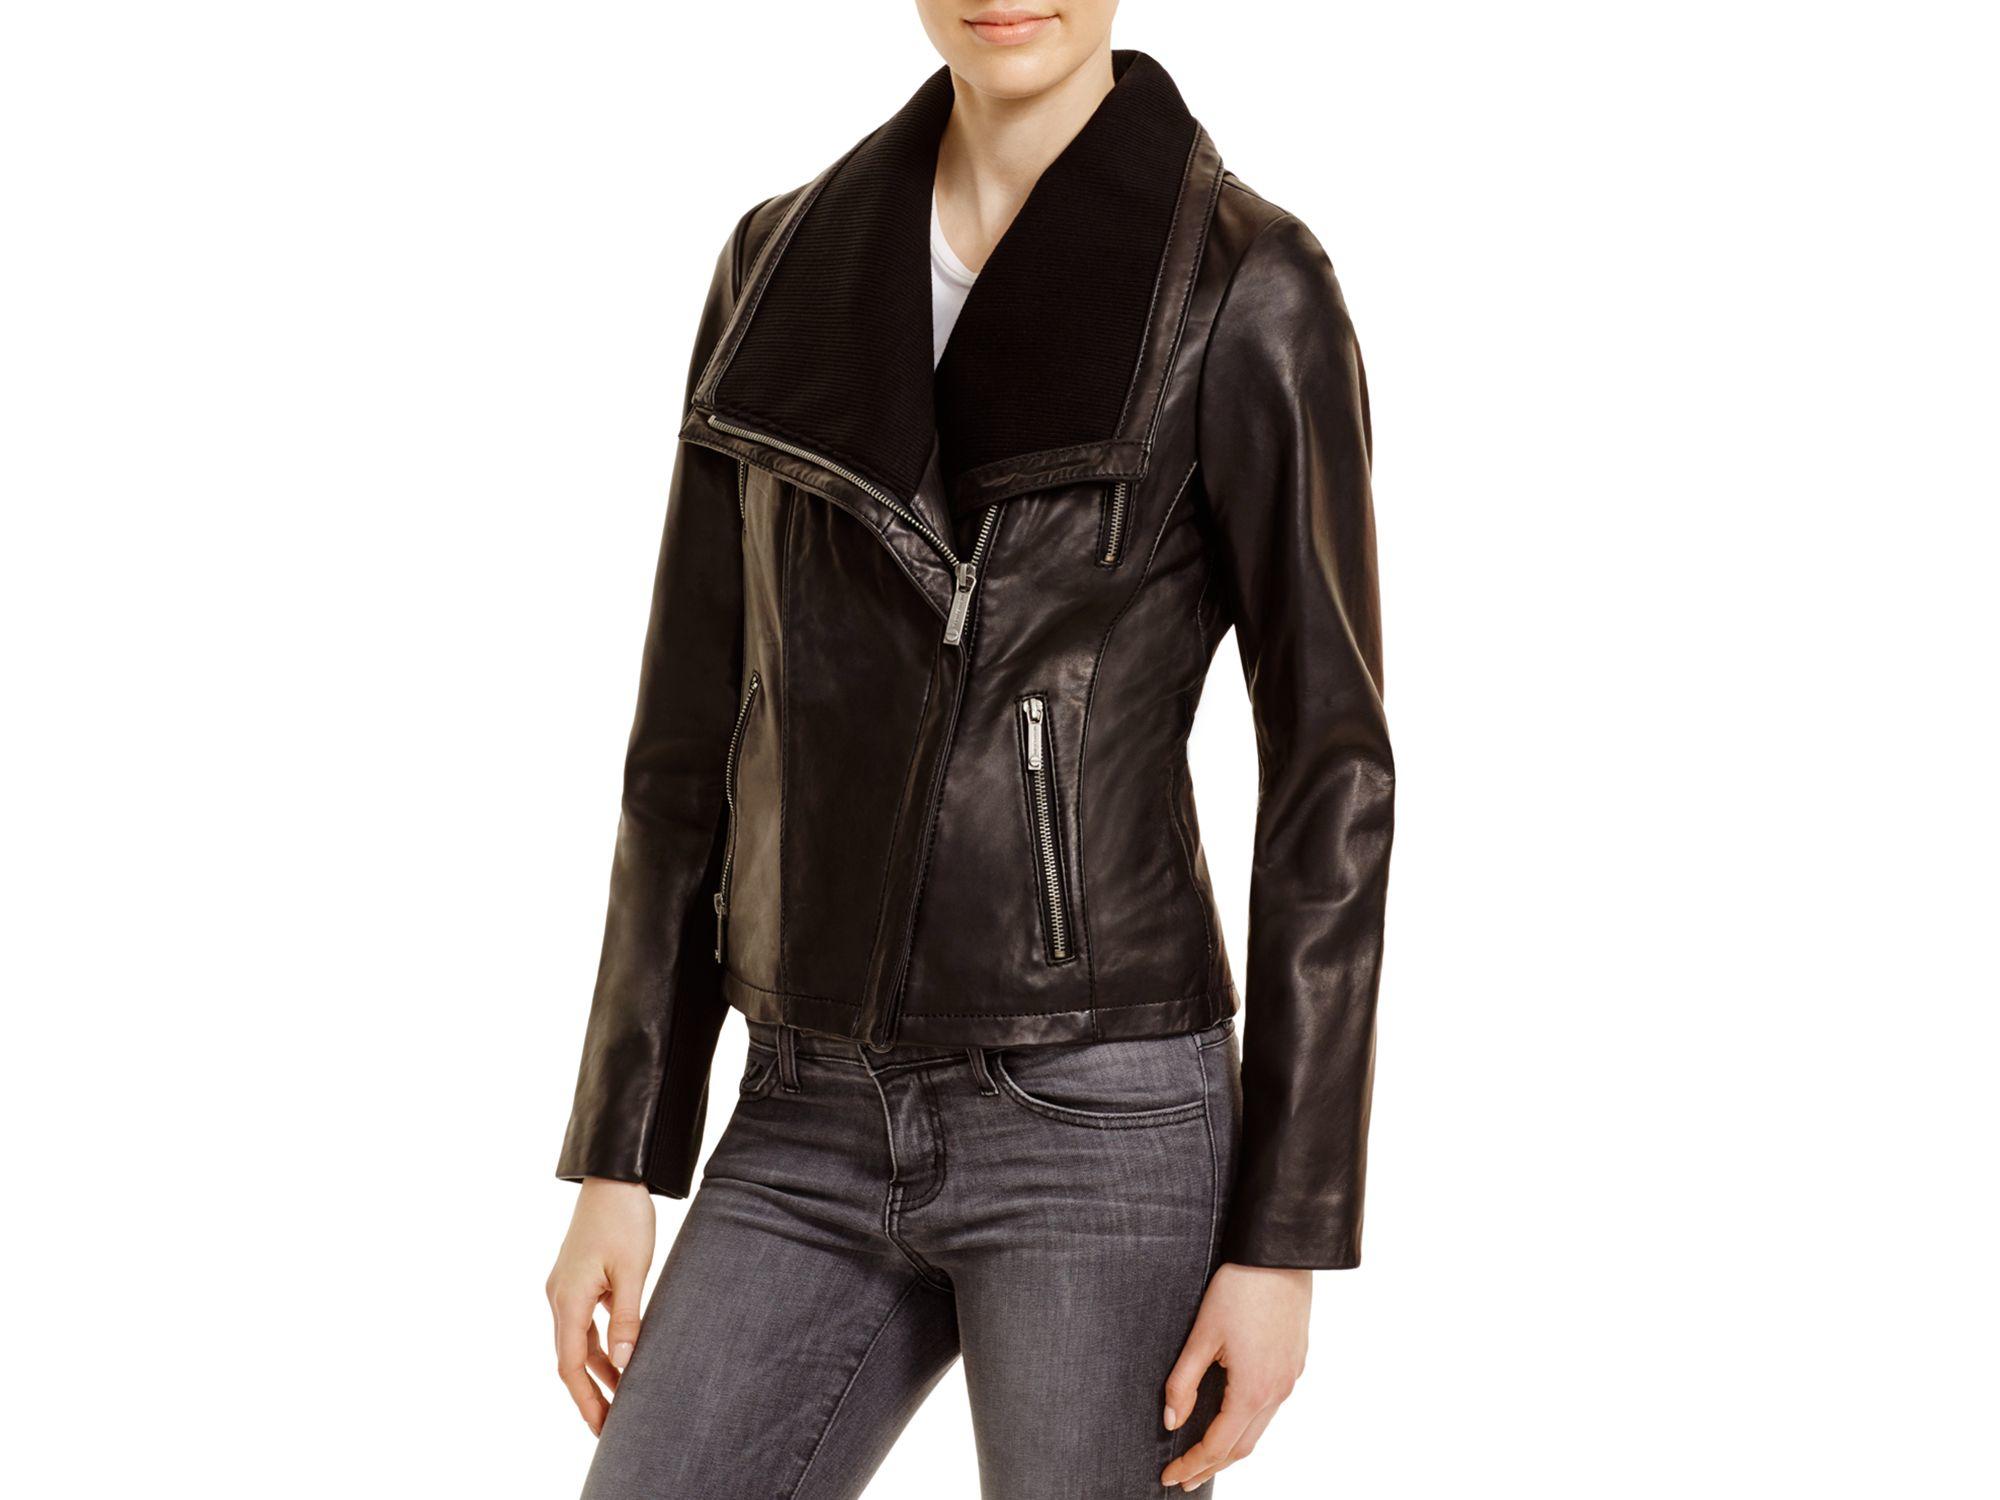 0ad75ca9 MICHAEL Michael Kors Asymmetric Zip Front Leather Jacket in Black - Lyst